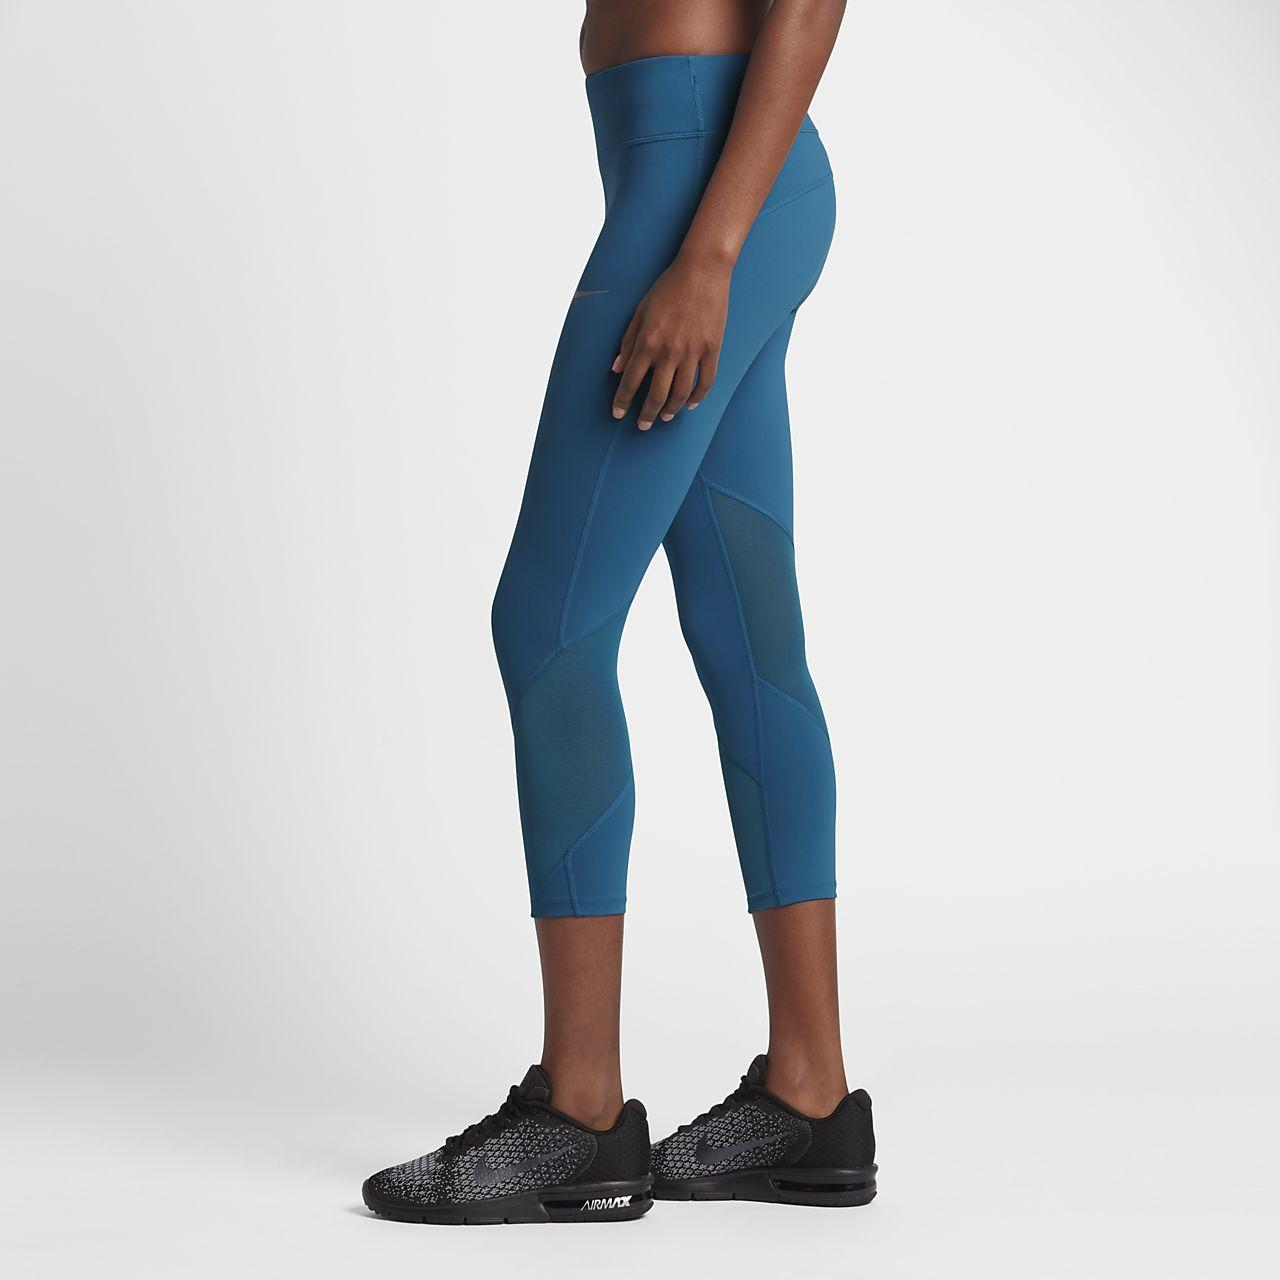 ... Nike Epic Lux Women's Running Crops